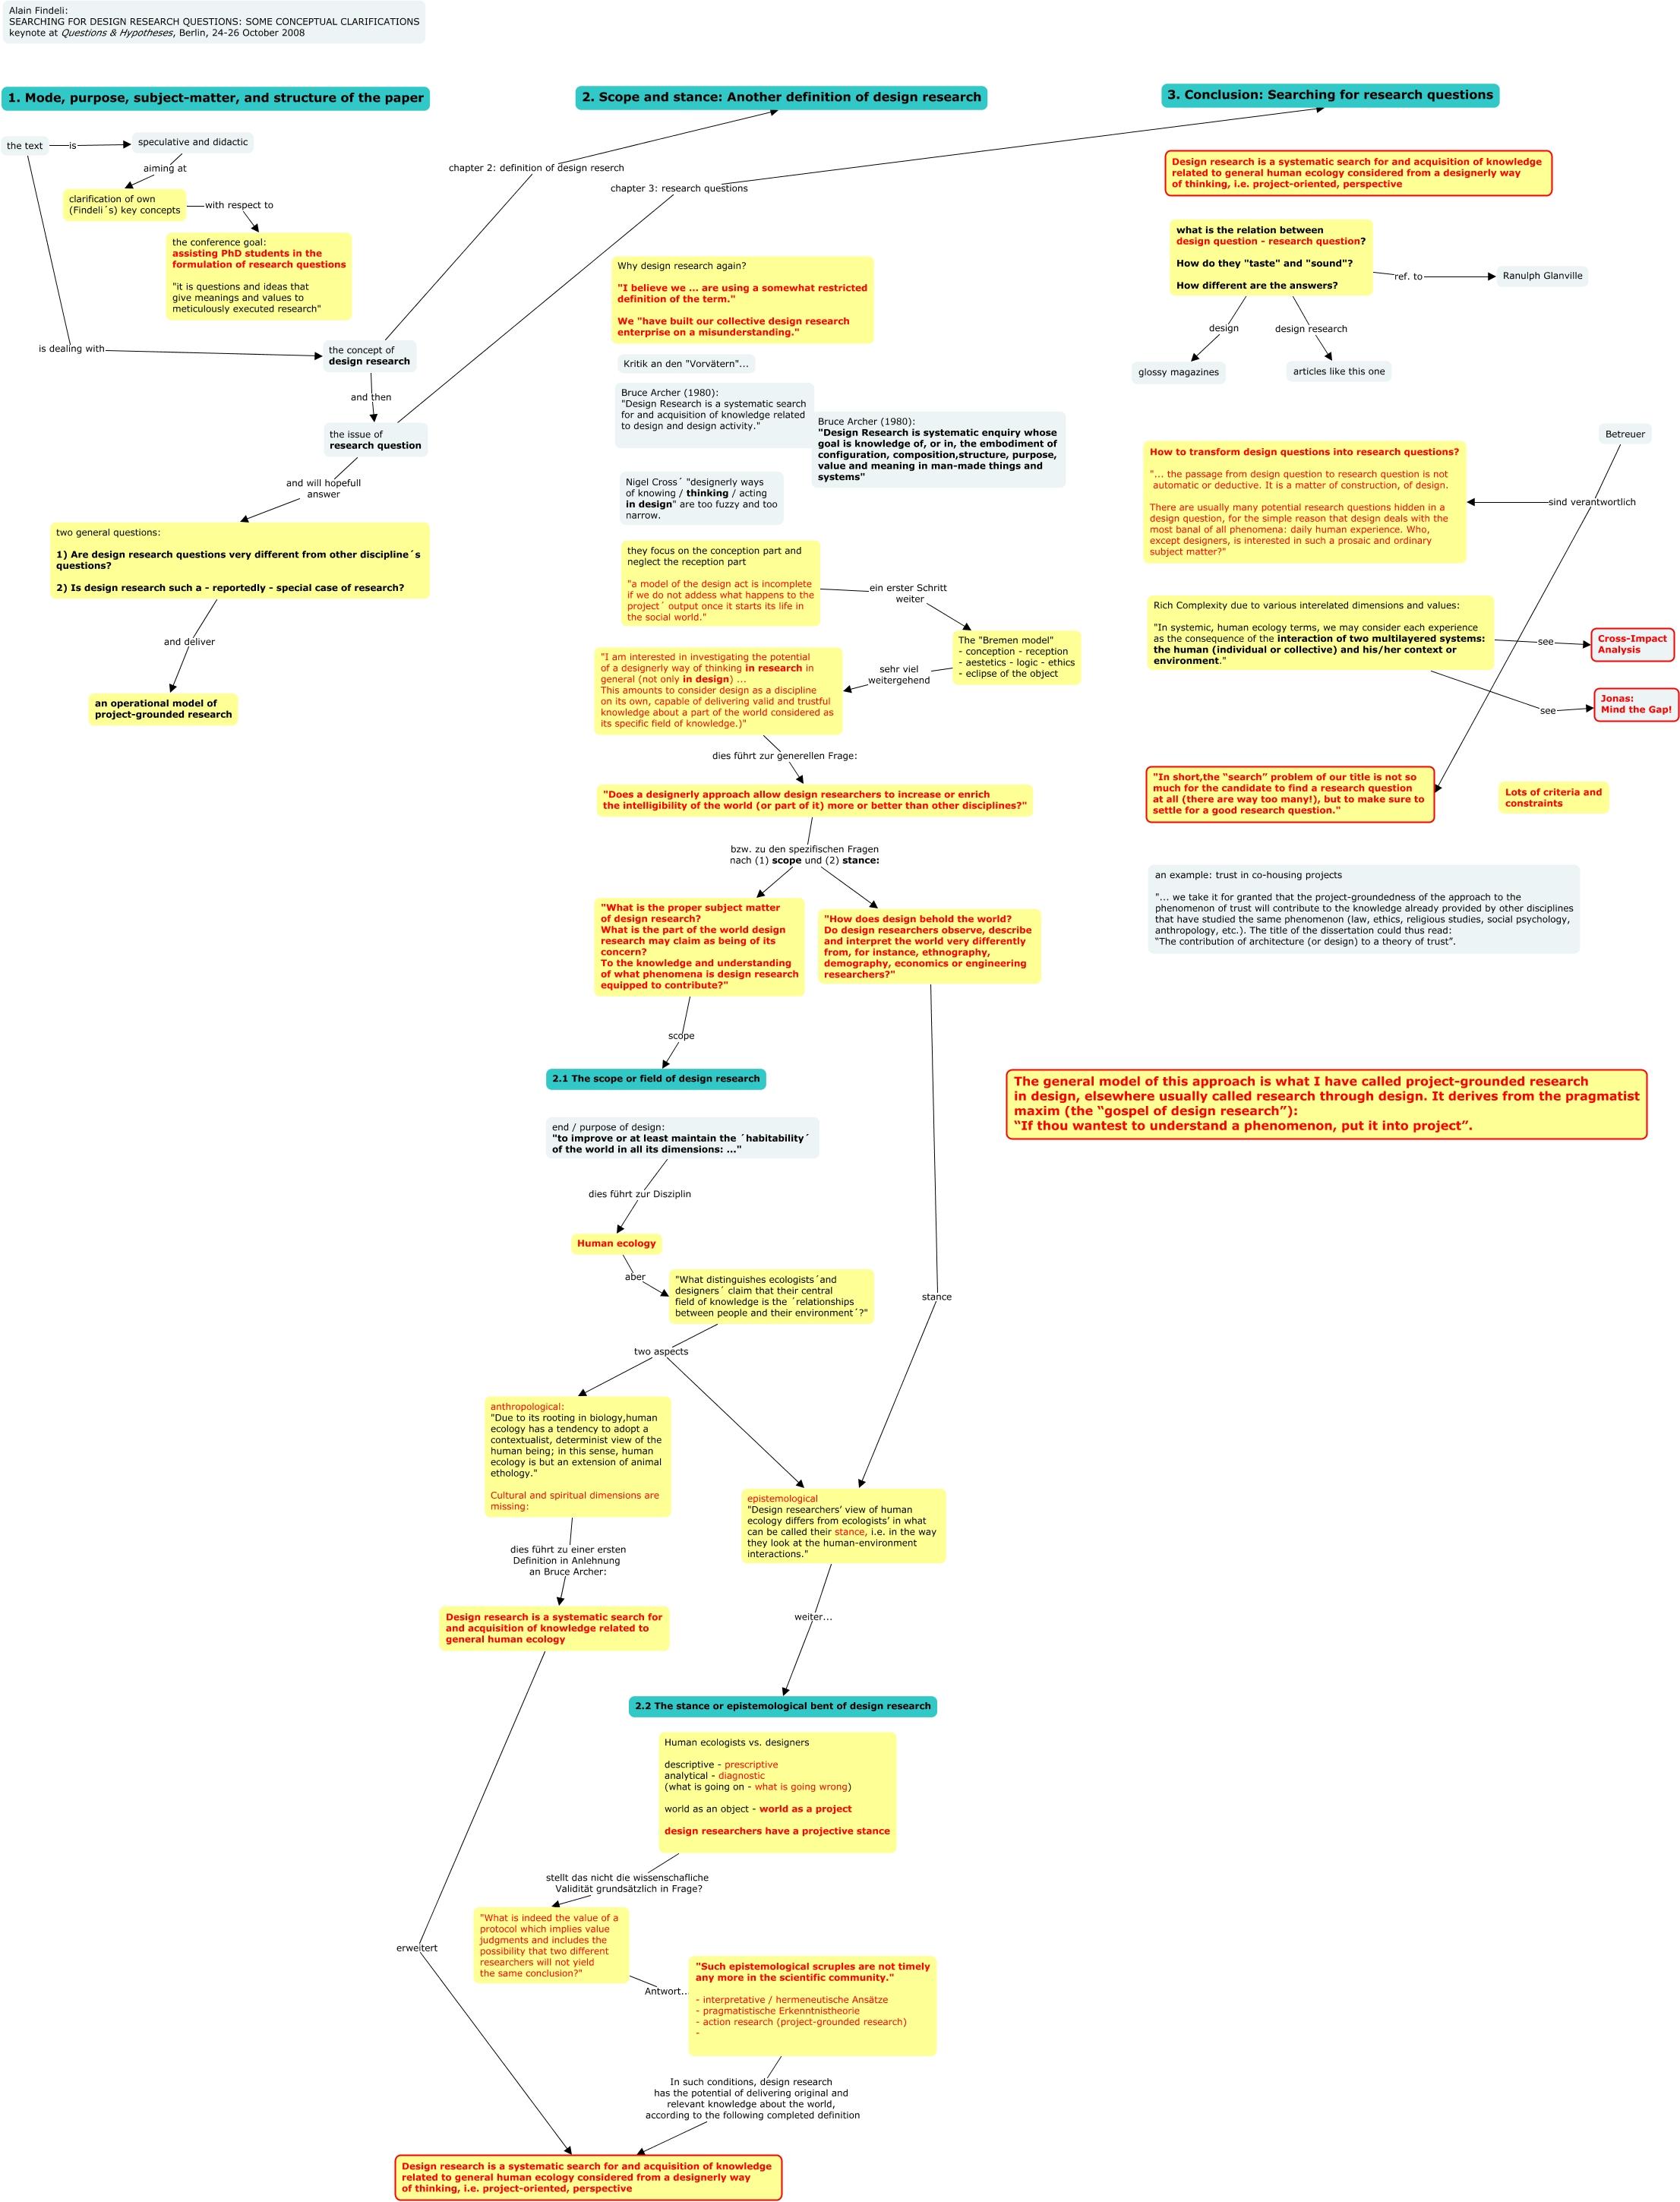 Findeli_Design Research